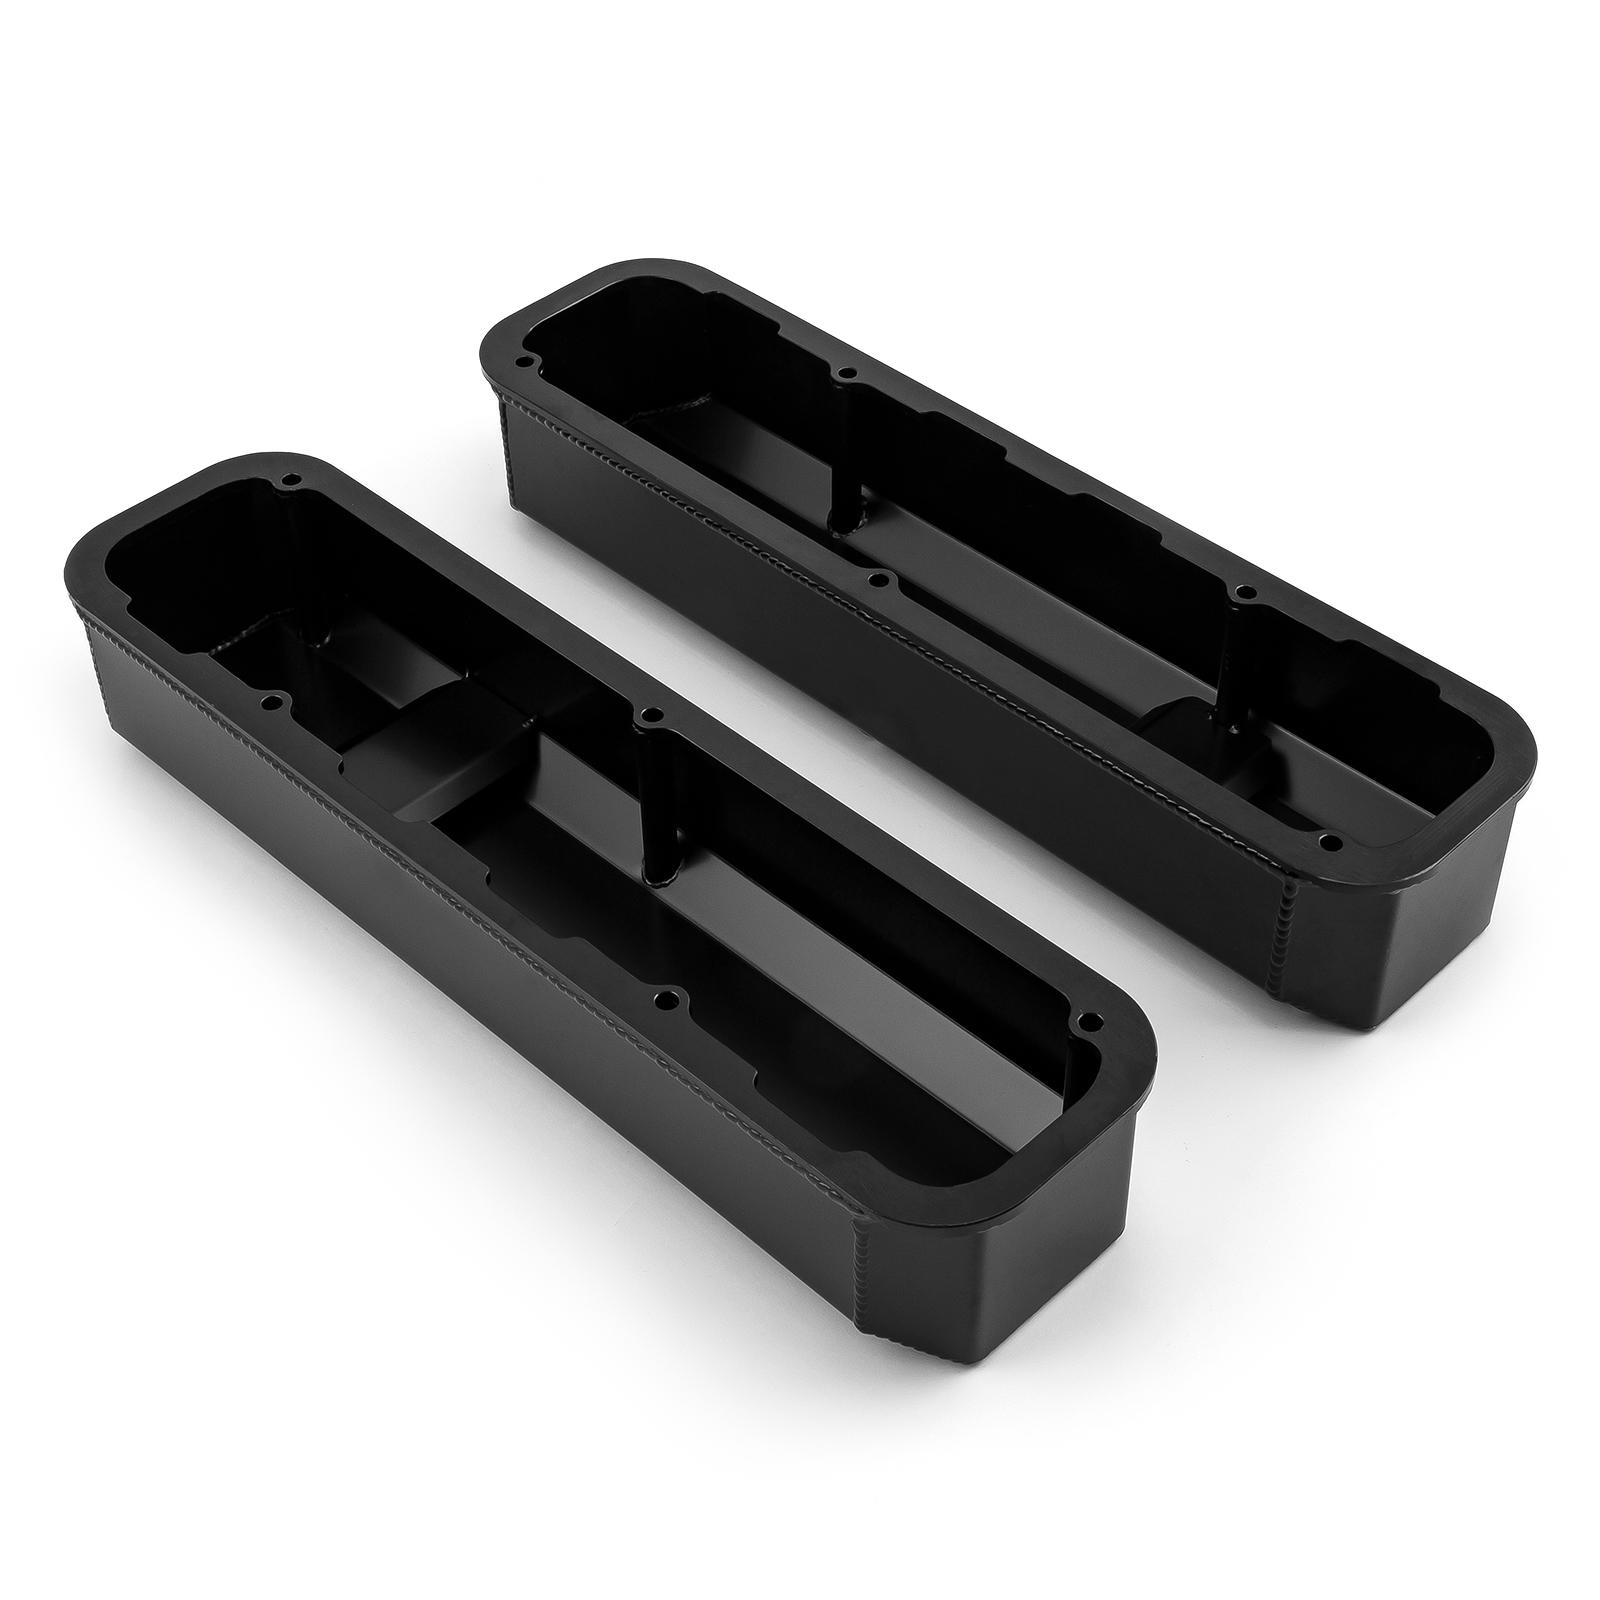 PCE® PCE314.1125.03 Mopar Chrysler SB 318 340 360 Fabricated Valve Covers Tall Black w/ Hole